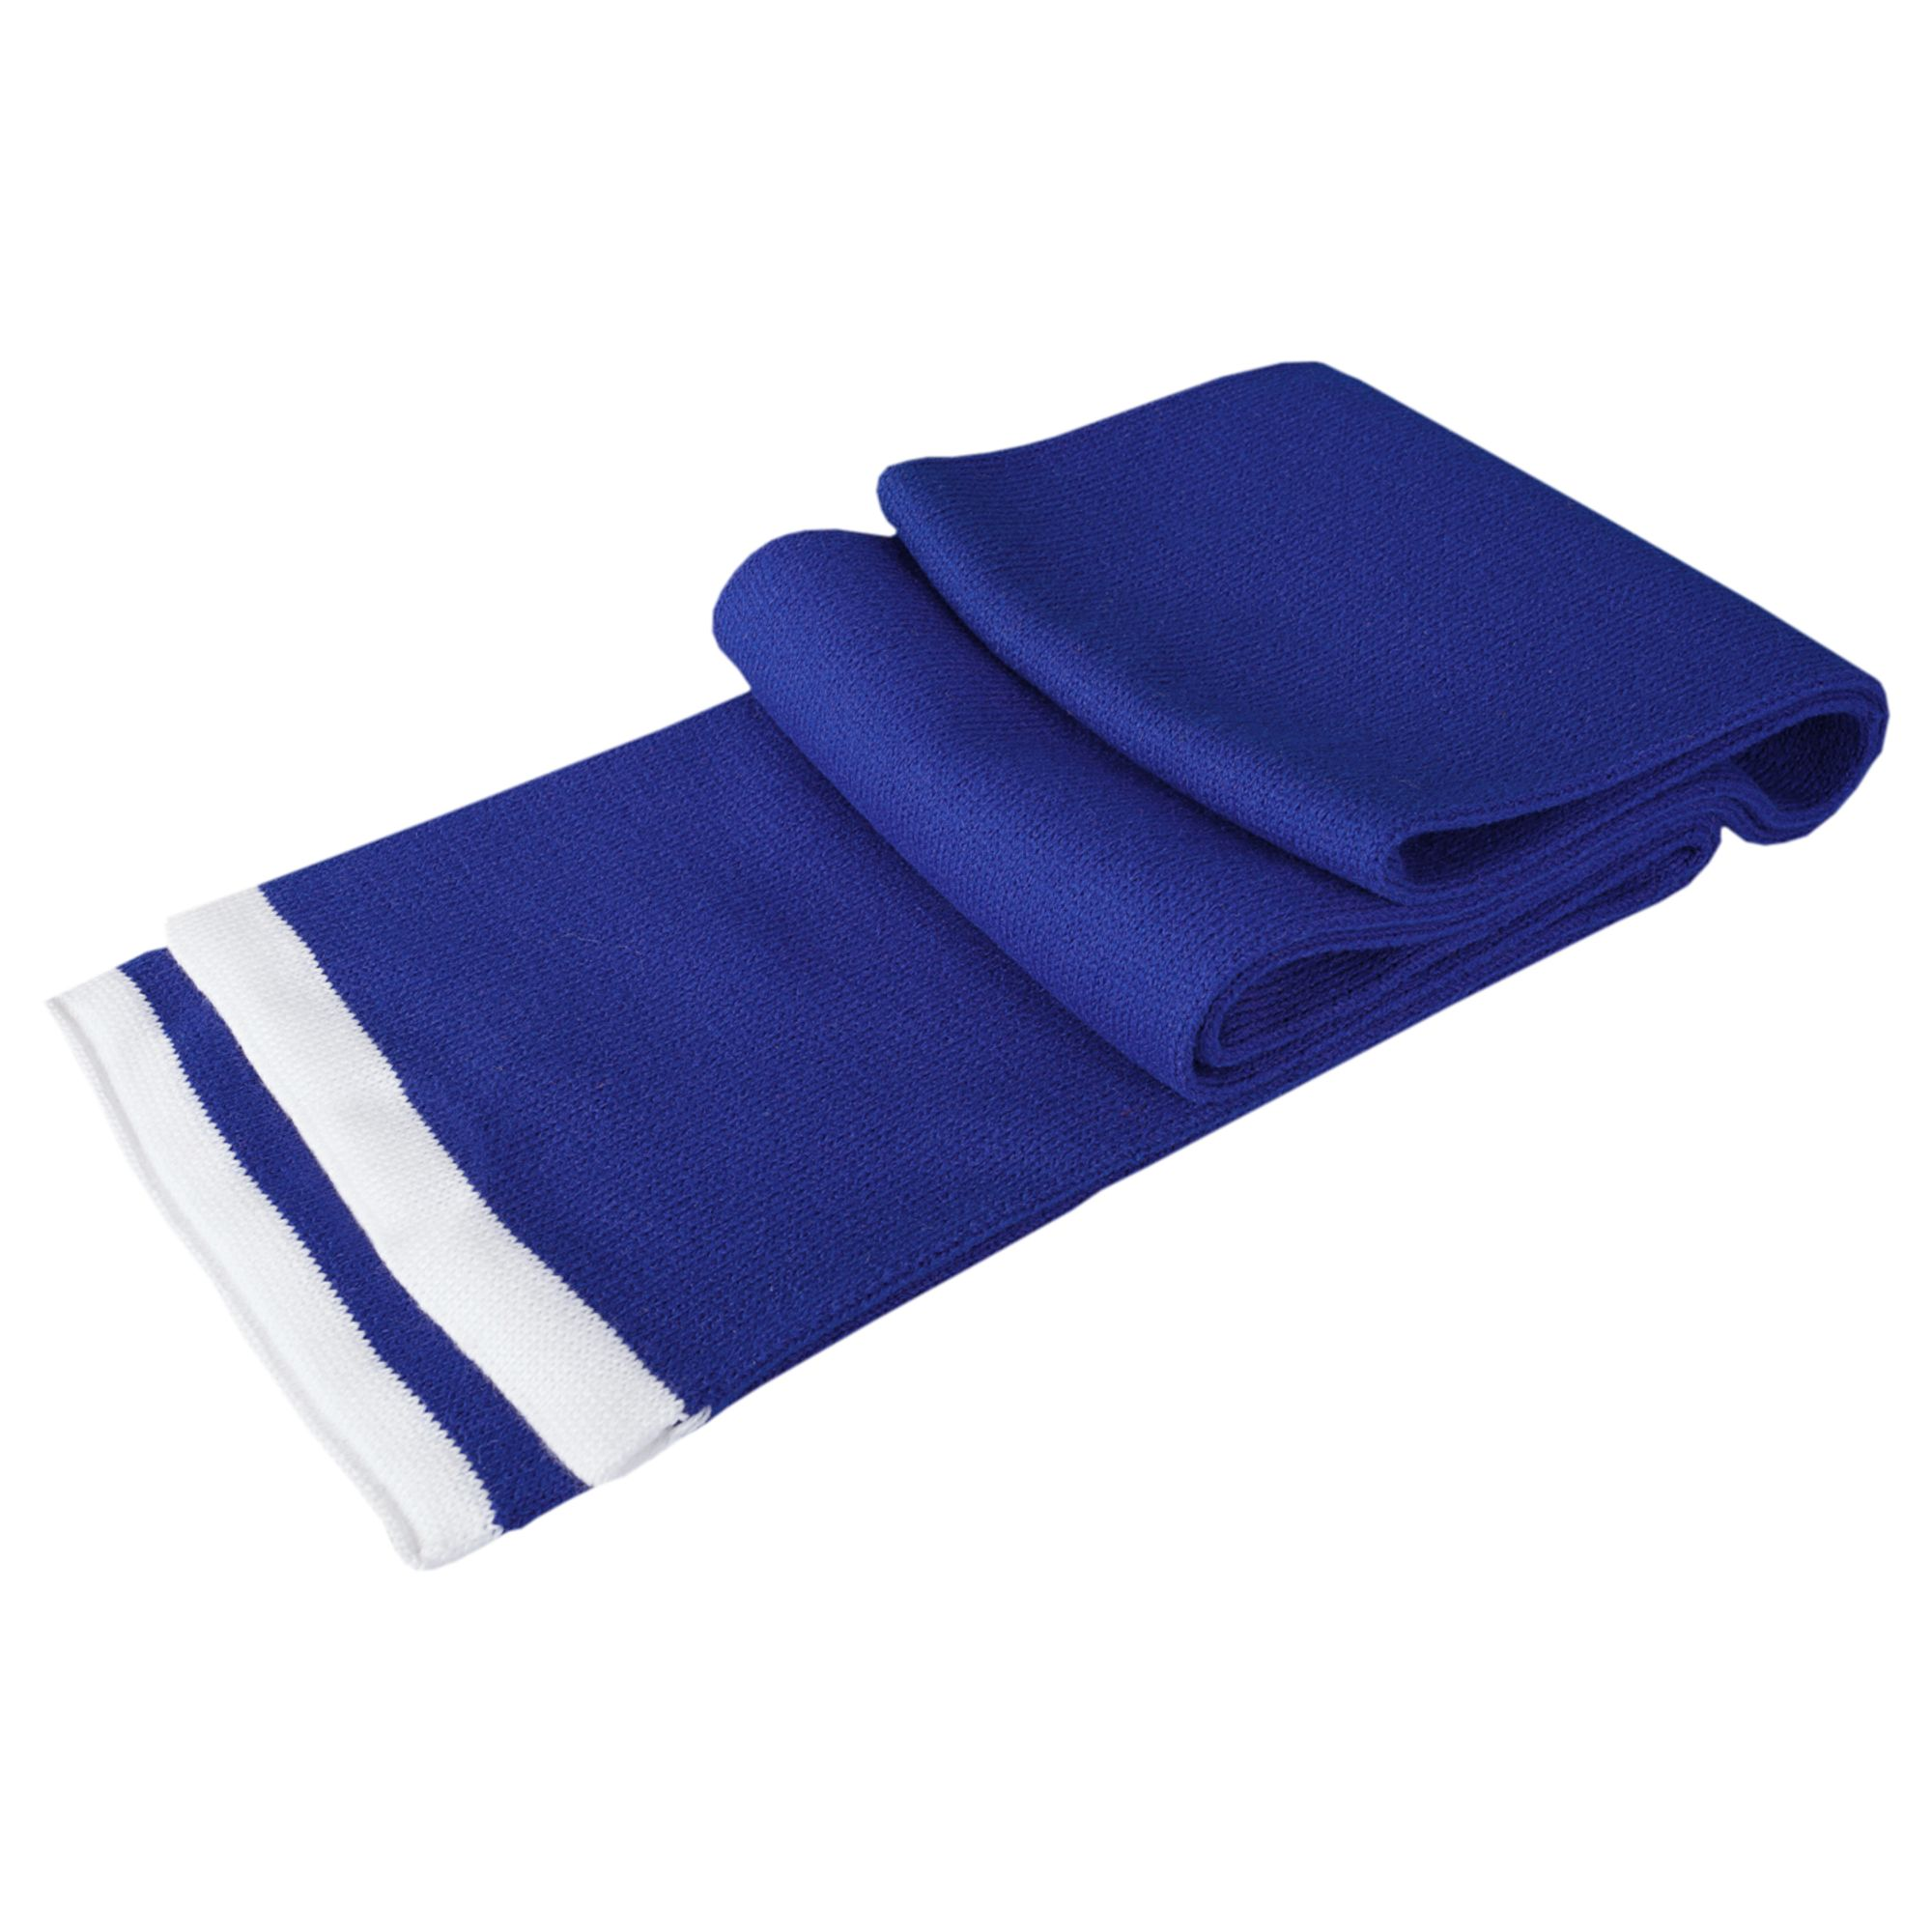 Шарф Leader, синий (василек) с белым